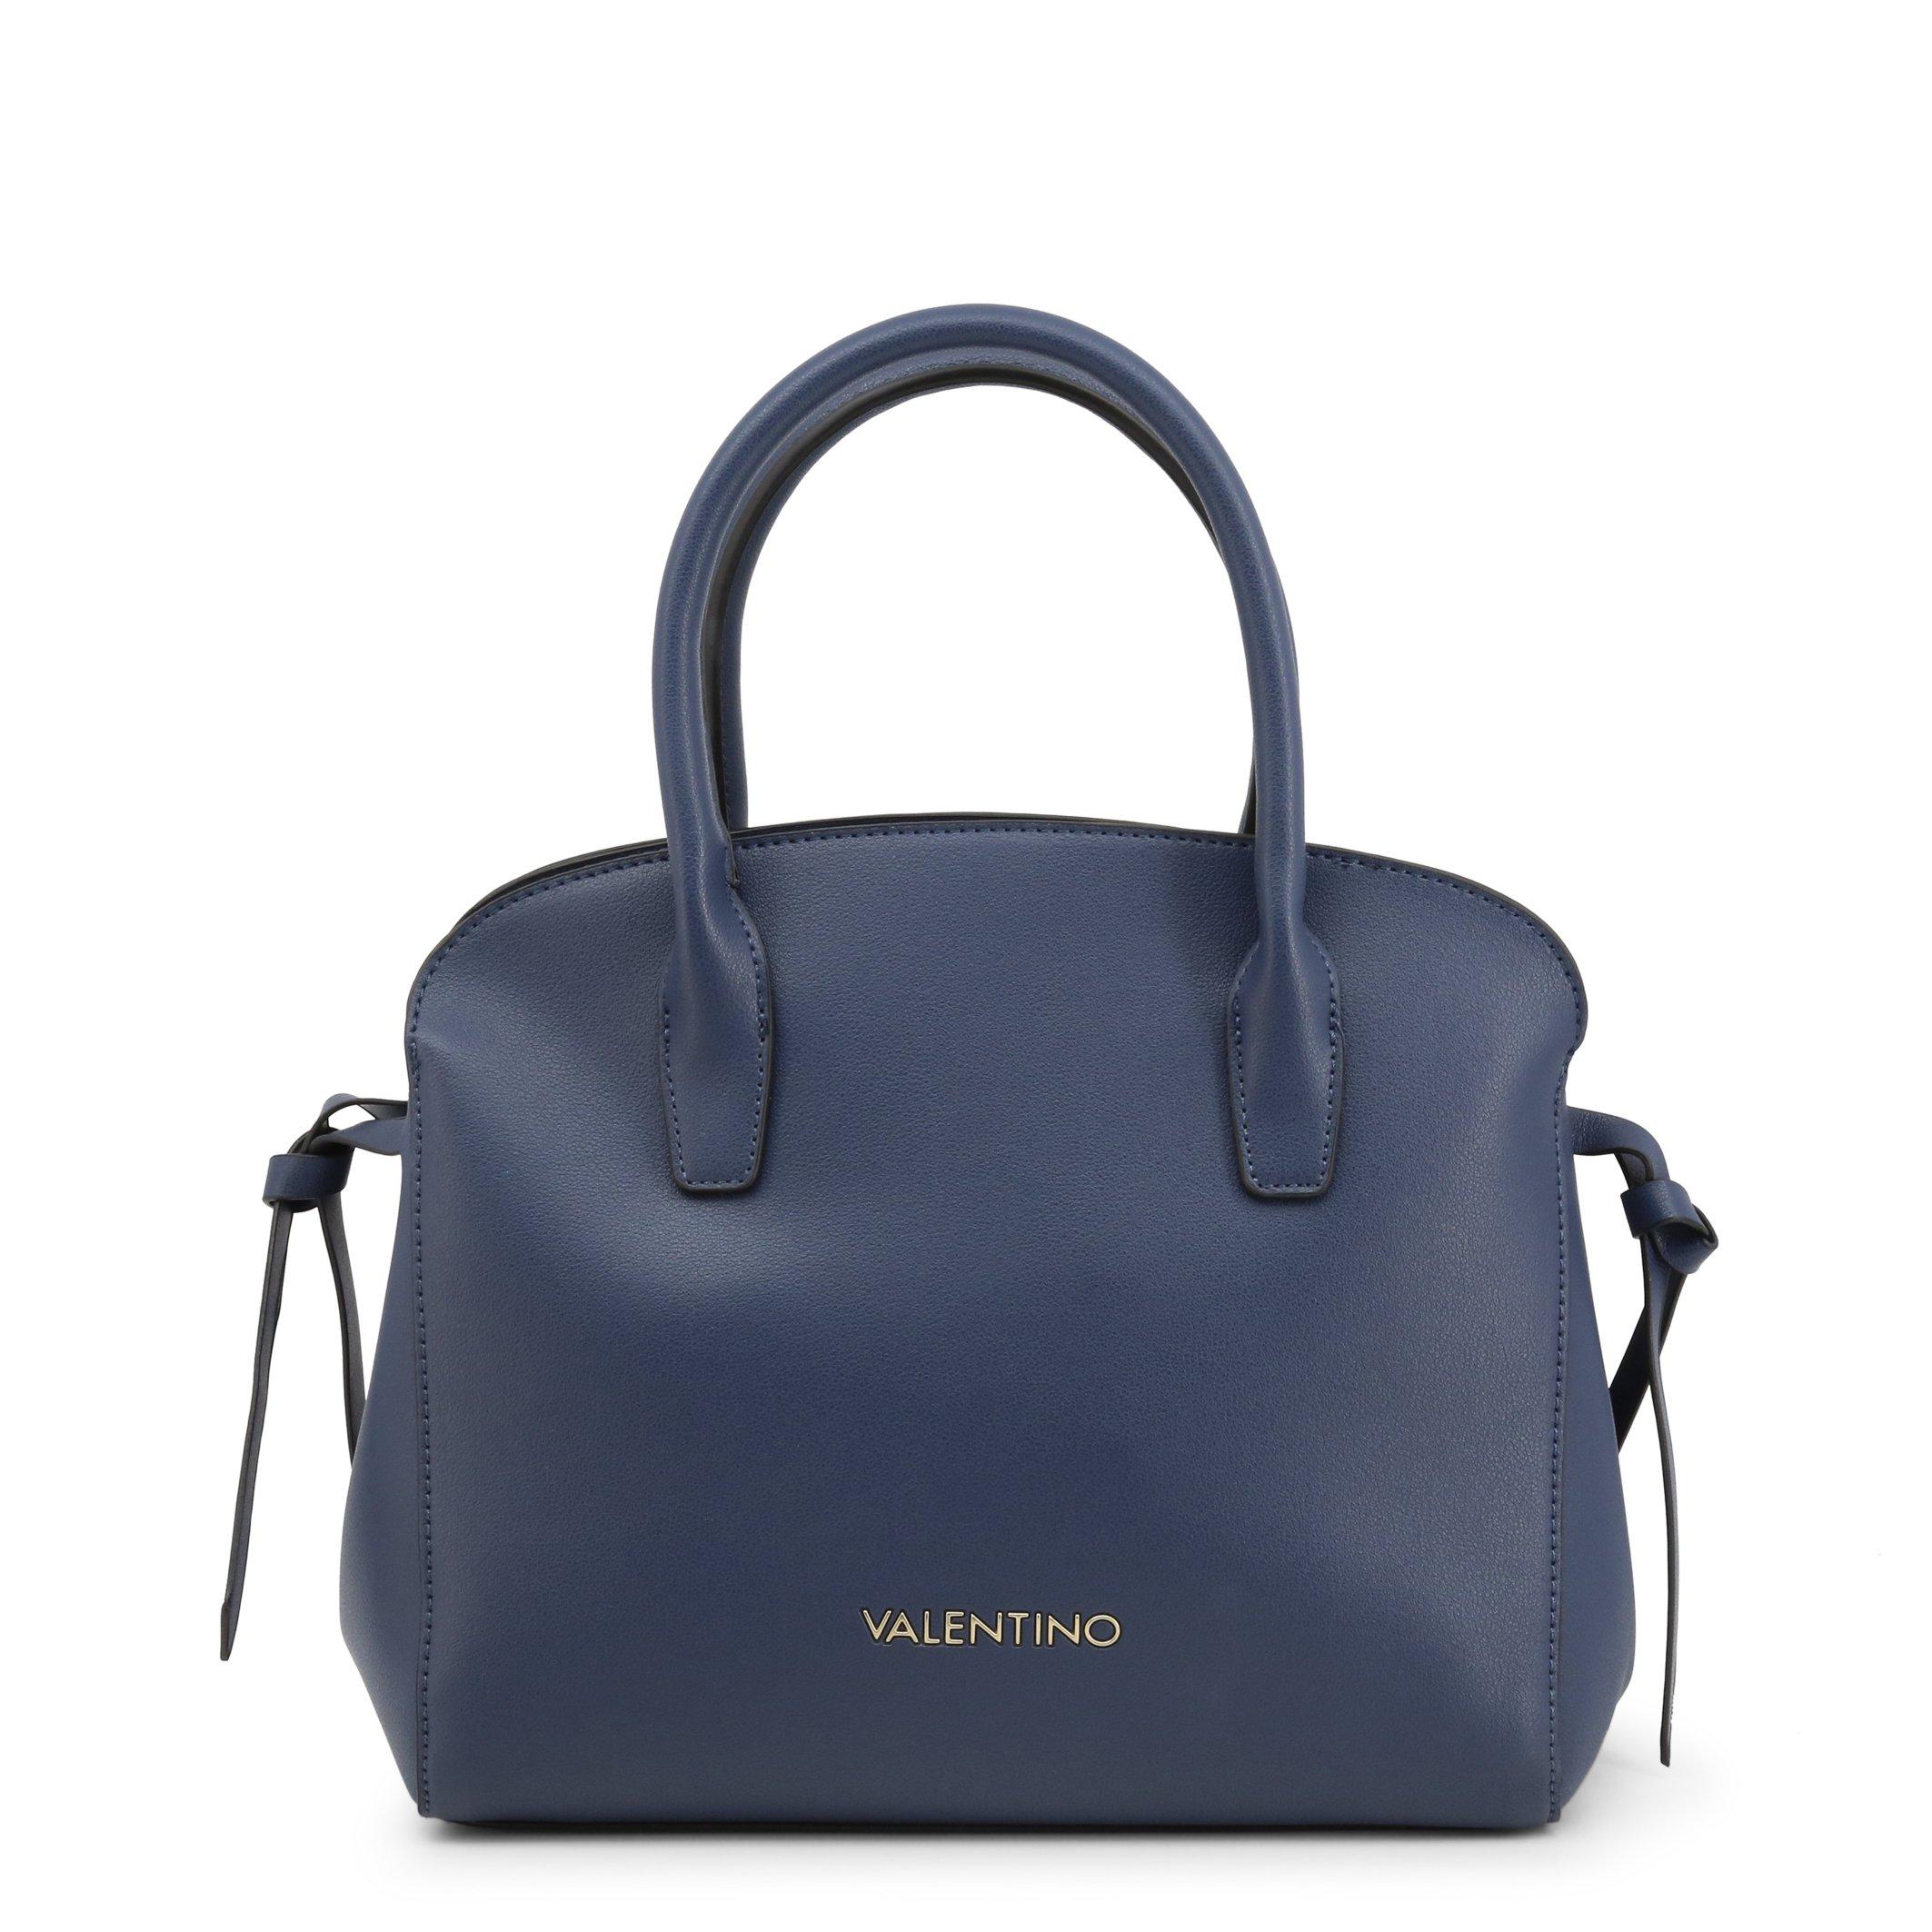 Valentino by Mario Valentino Women's Handbag Various Colours BURU-VBS3UO02 - blue NOSIZE